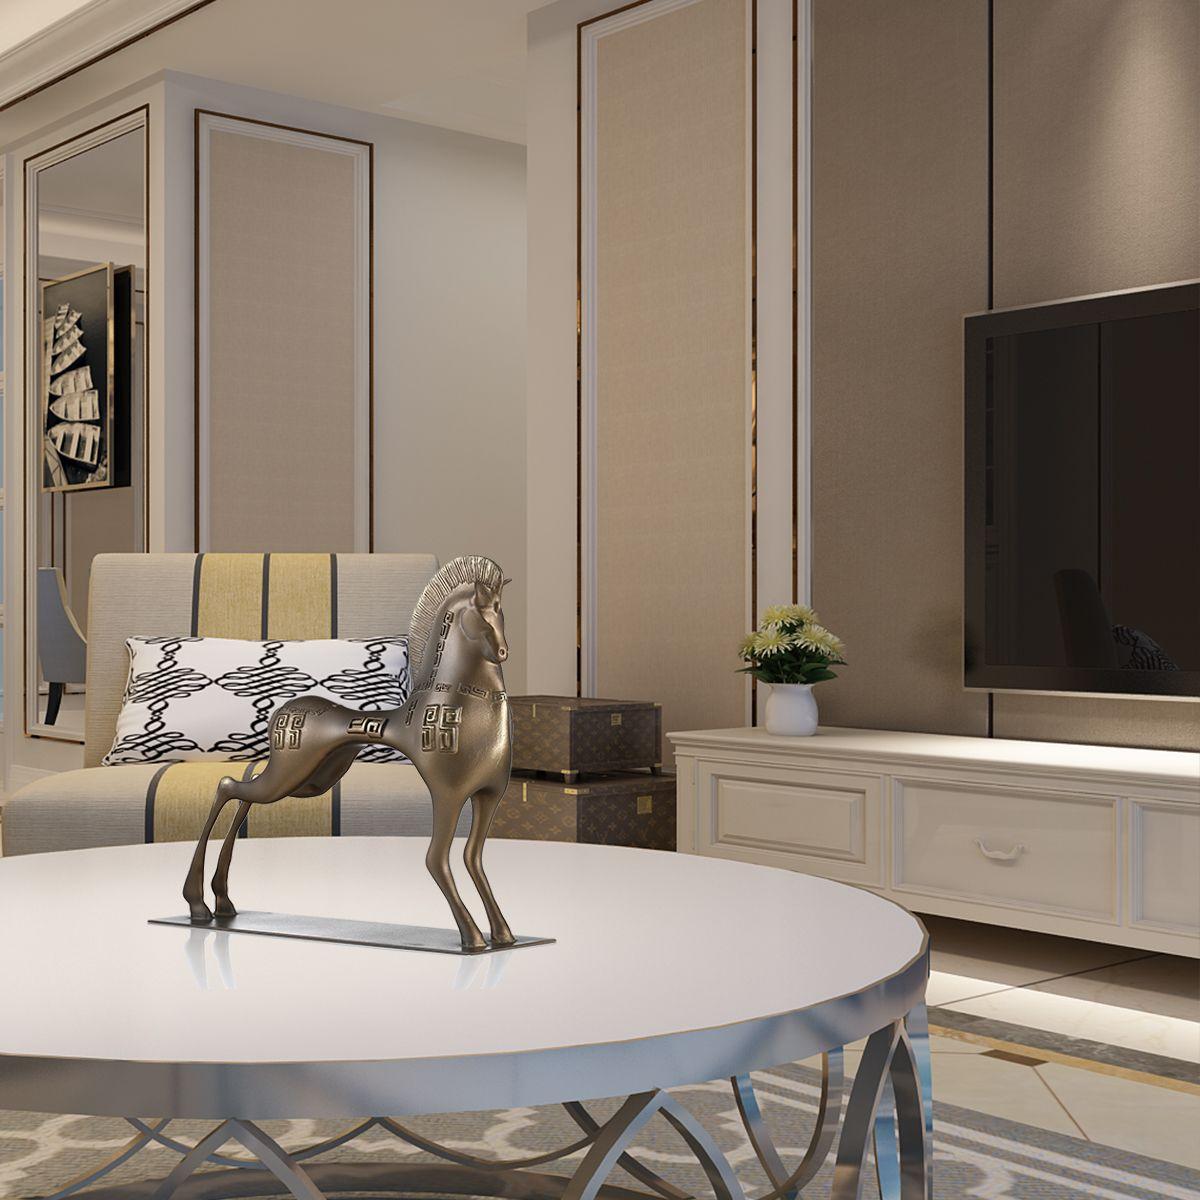 Tomfeel Vigorous Horse Fiberglass Sculpture Home Decoration Original Design Horse For Home Office